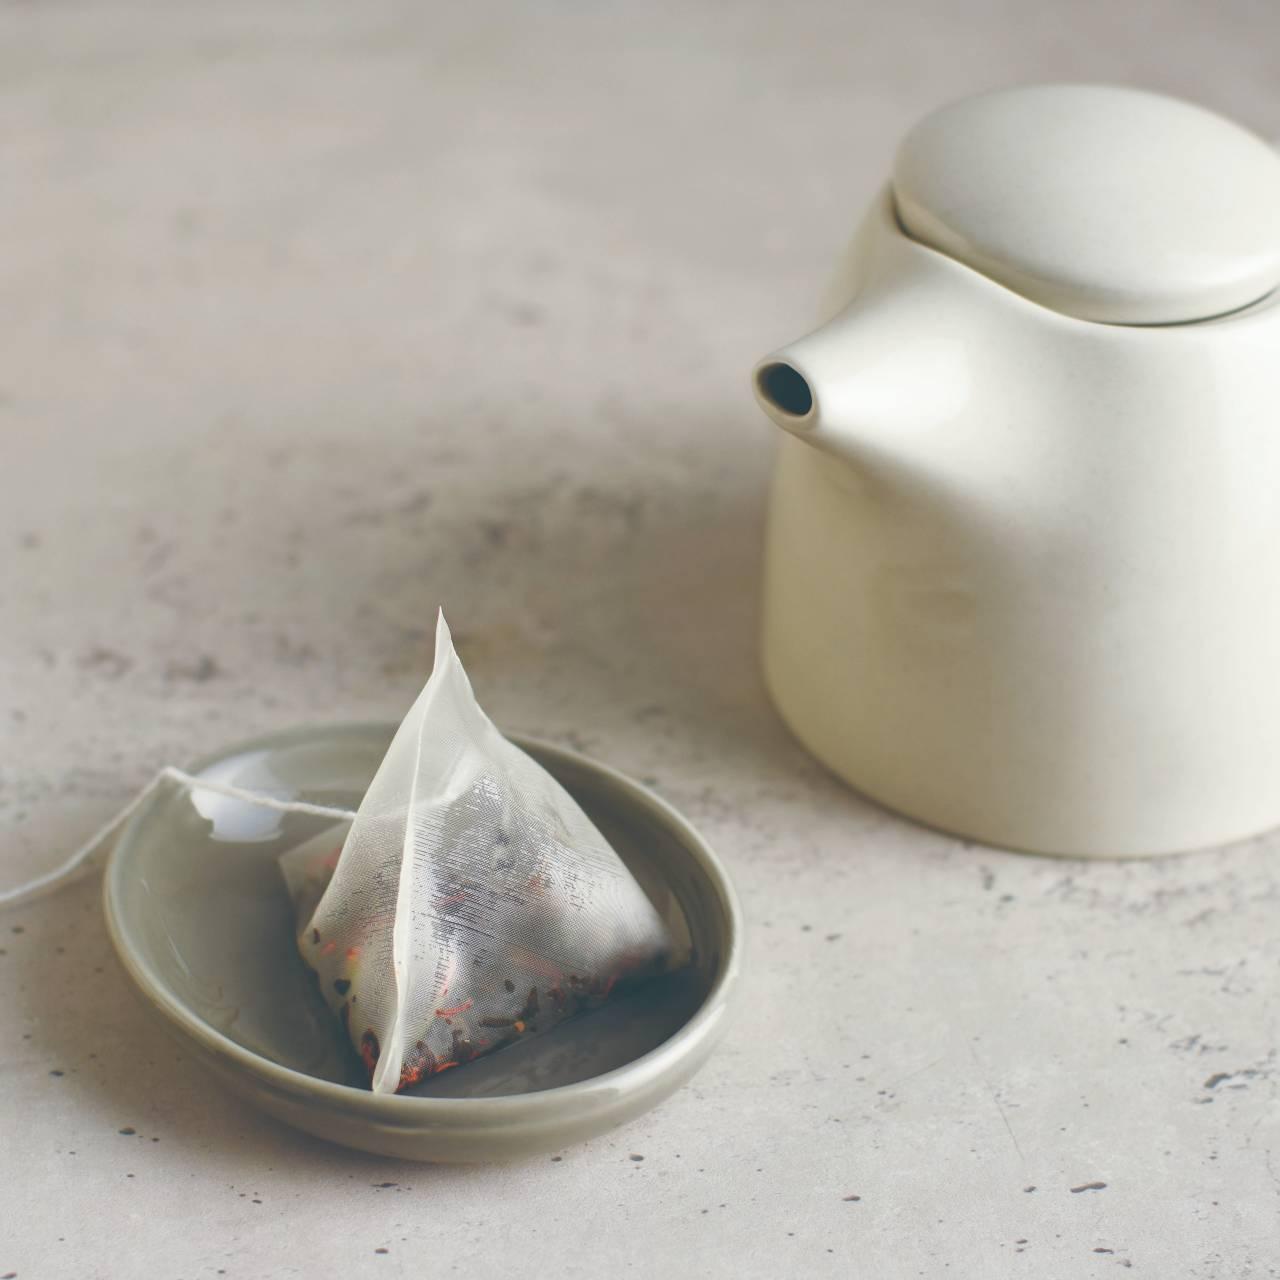 KINTO TOPO TEA BAG REST 100MM GREY THUMBNAIL 1